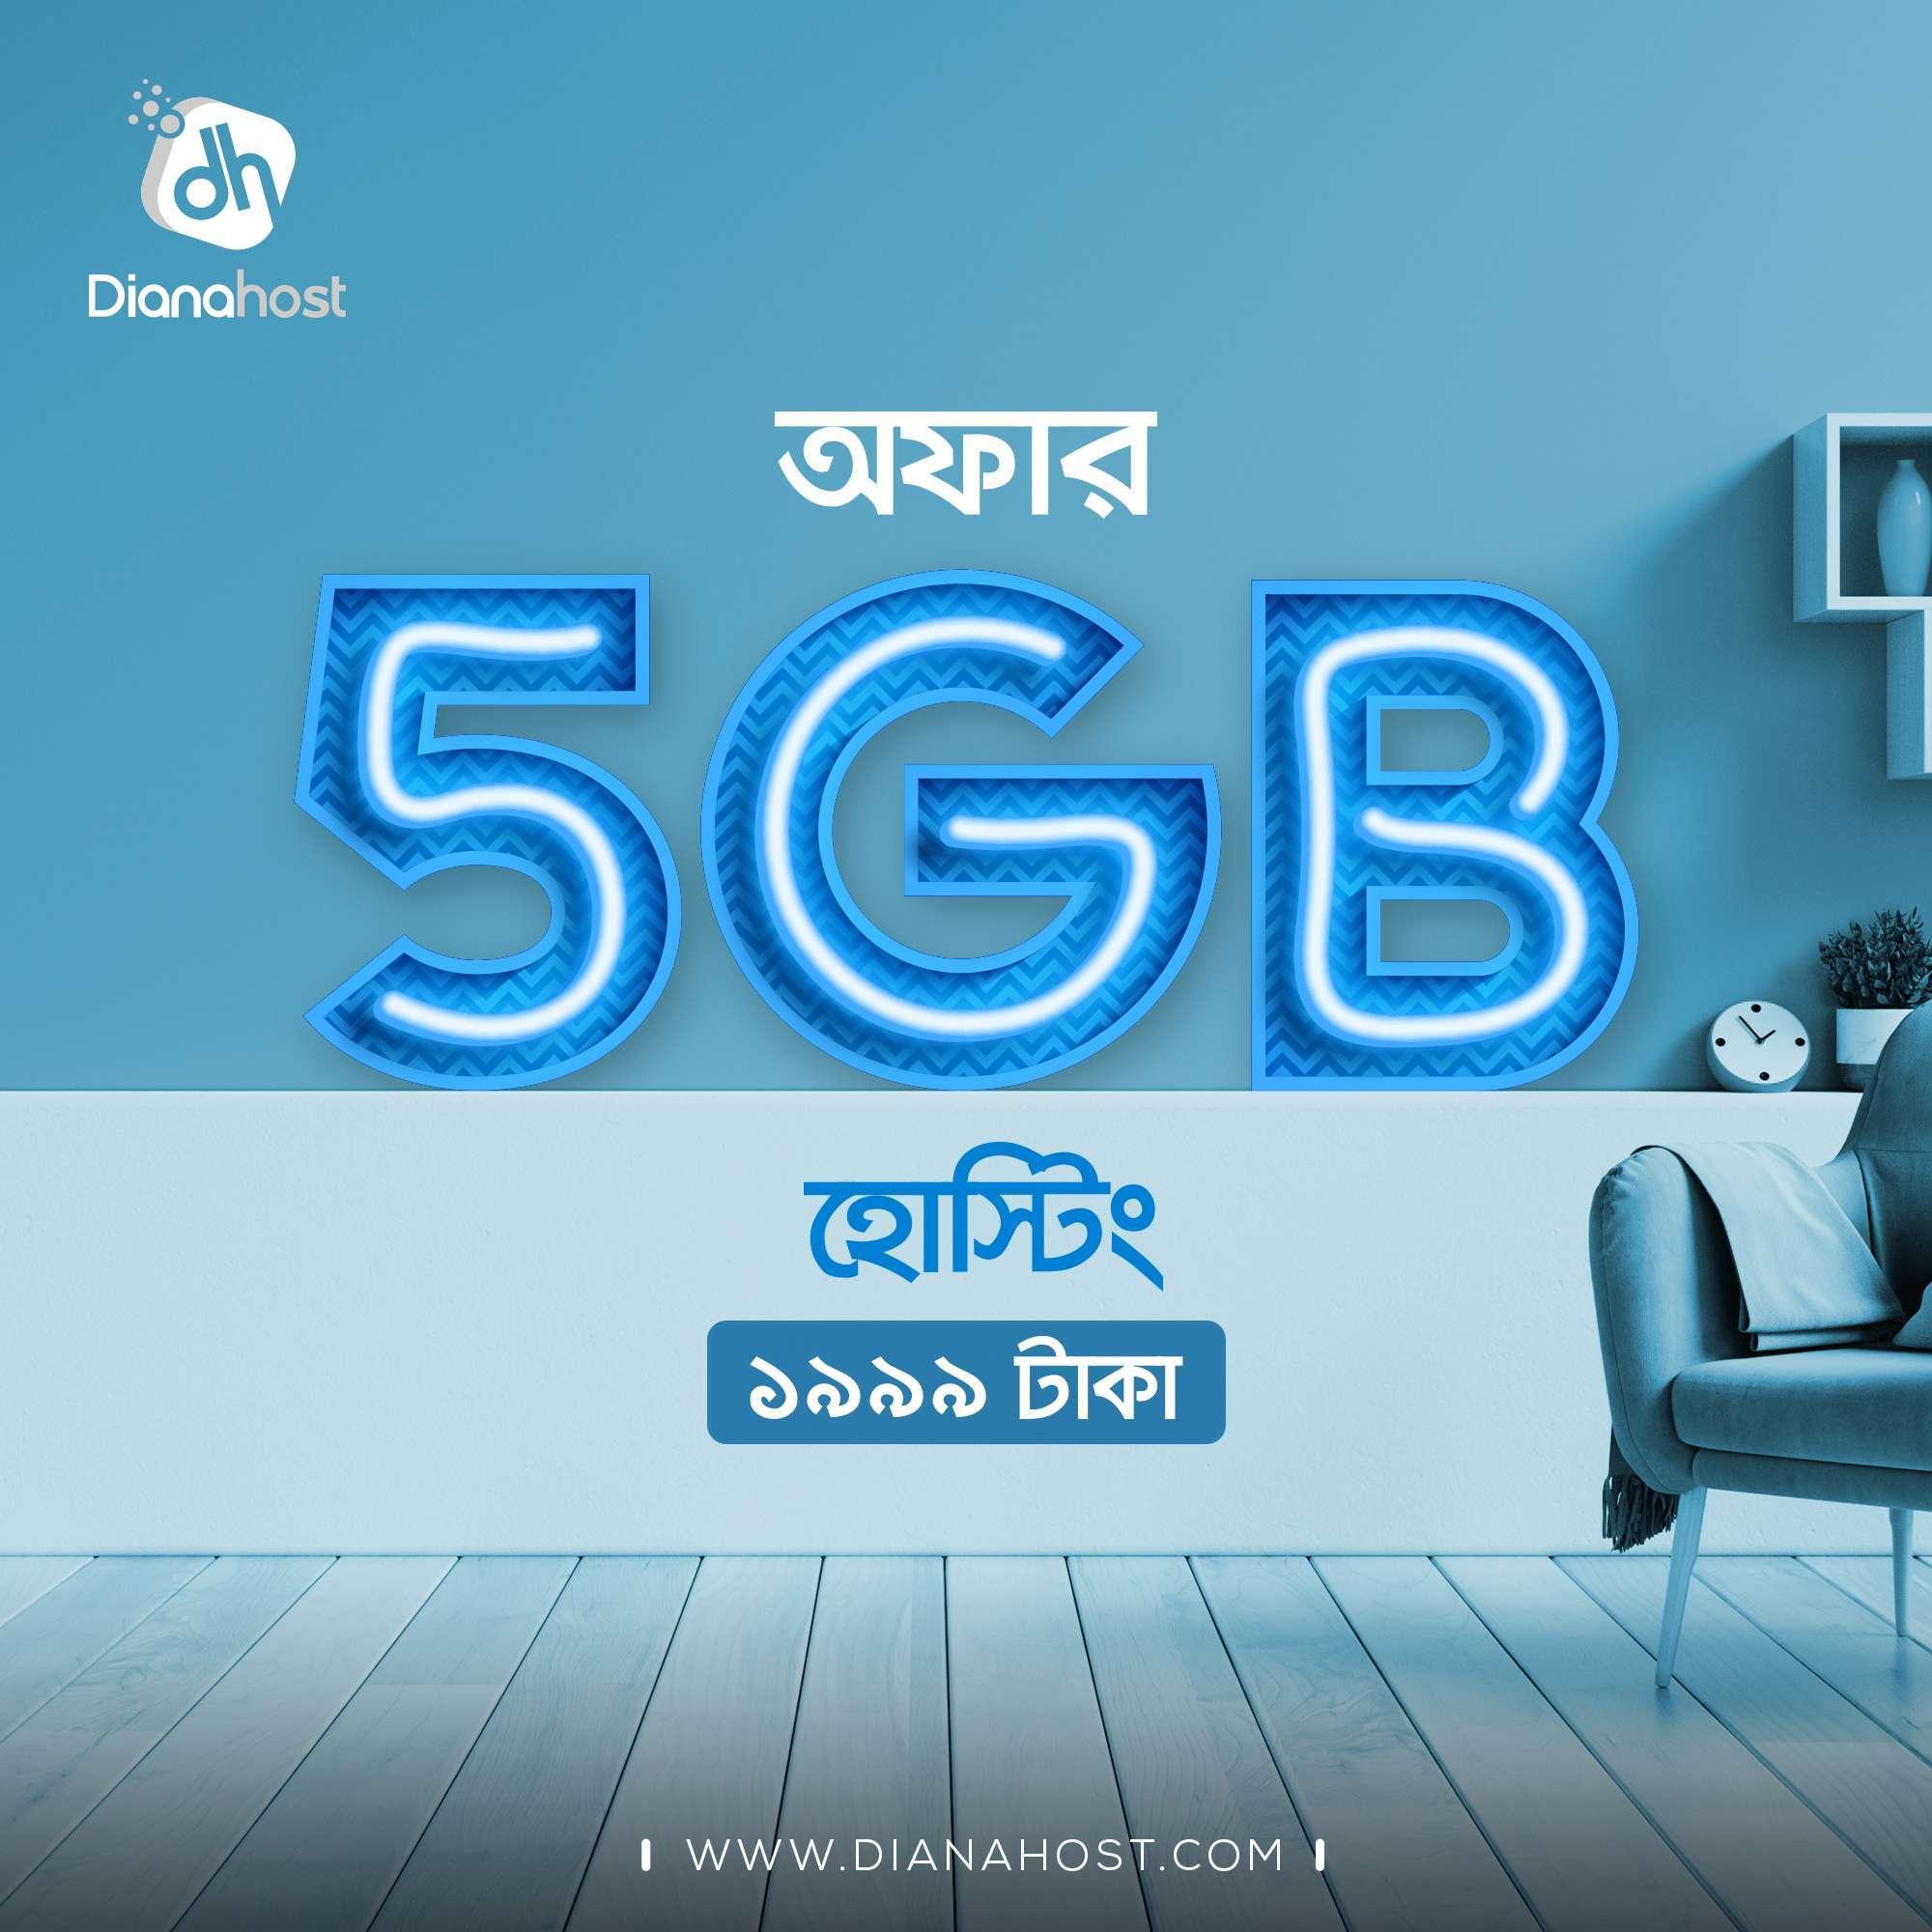 5 gb hosting offer